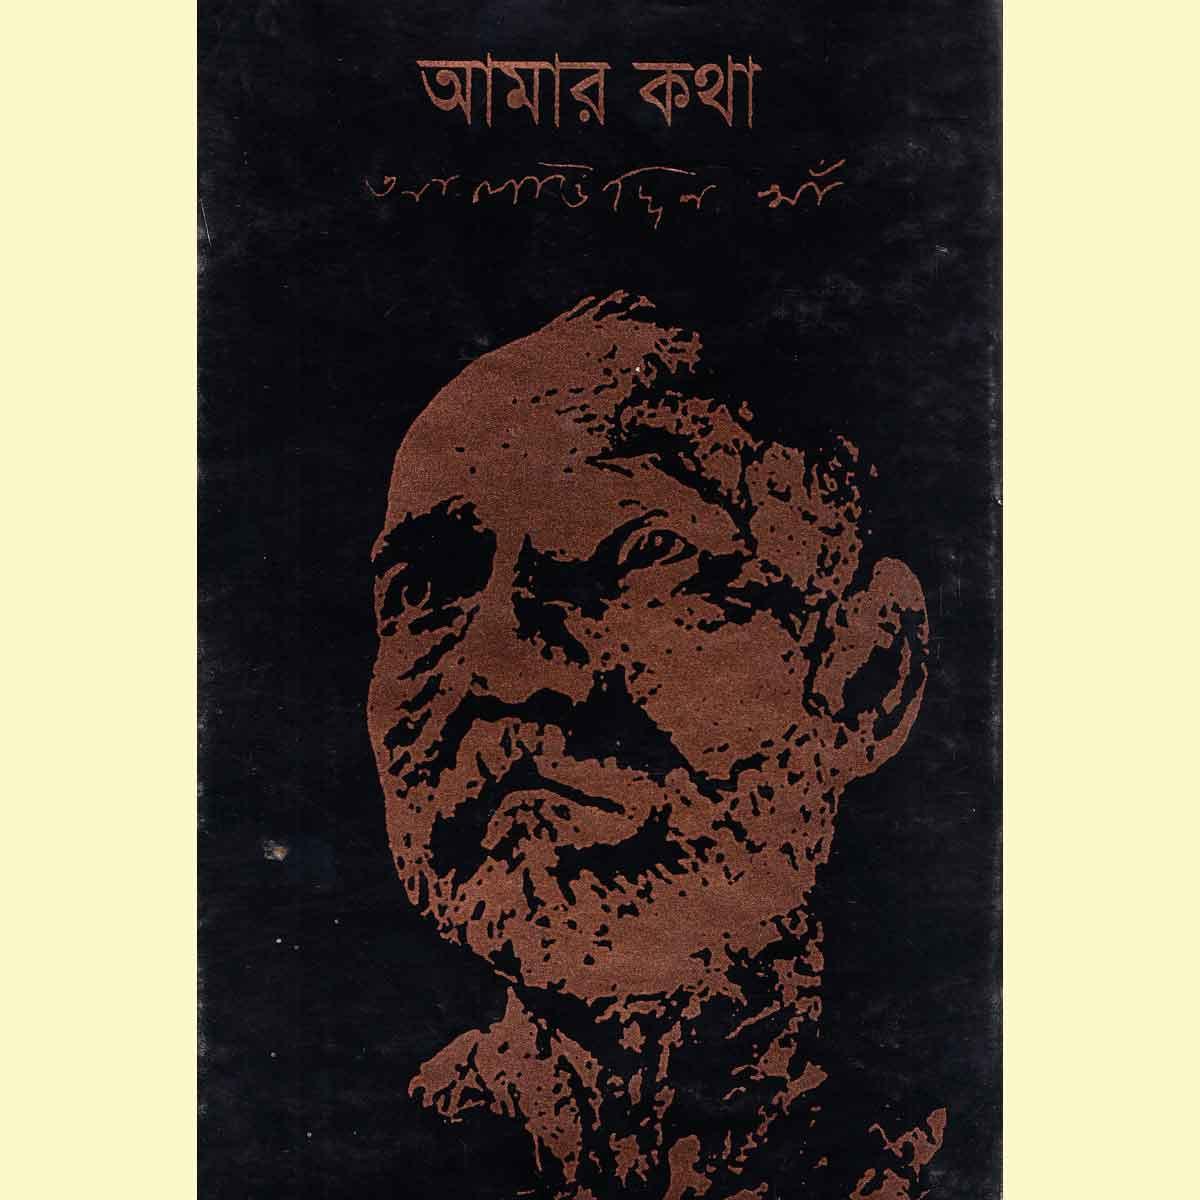 Amar Kotha: Allauddin Khan/আমার কথা: আলাউদ্দিন খাঁ